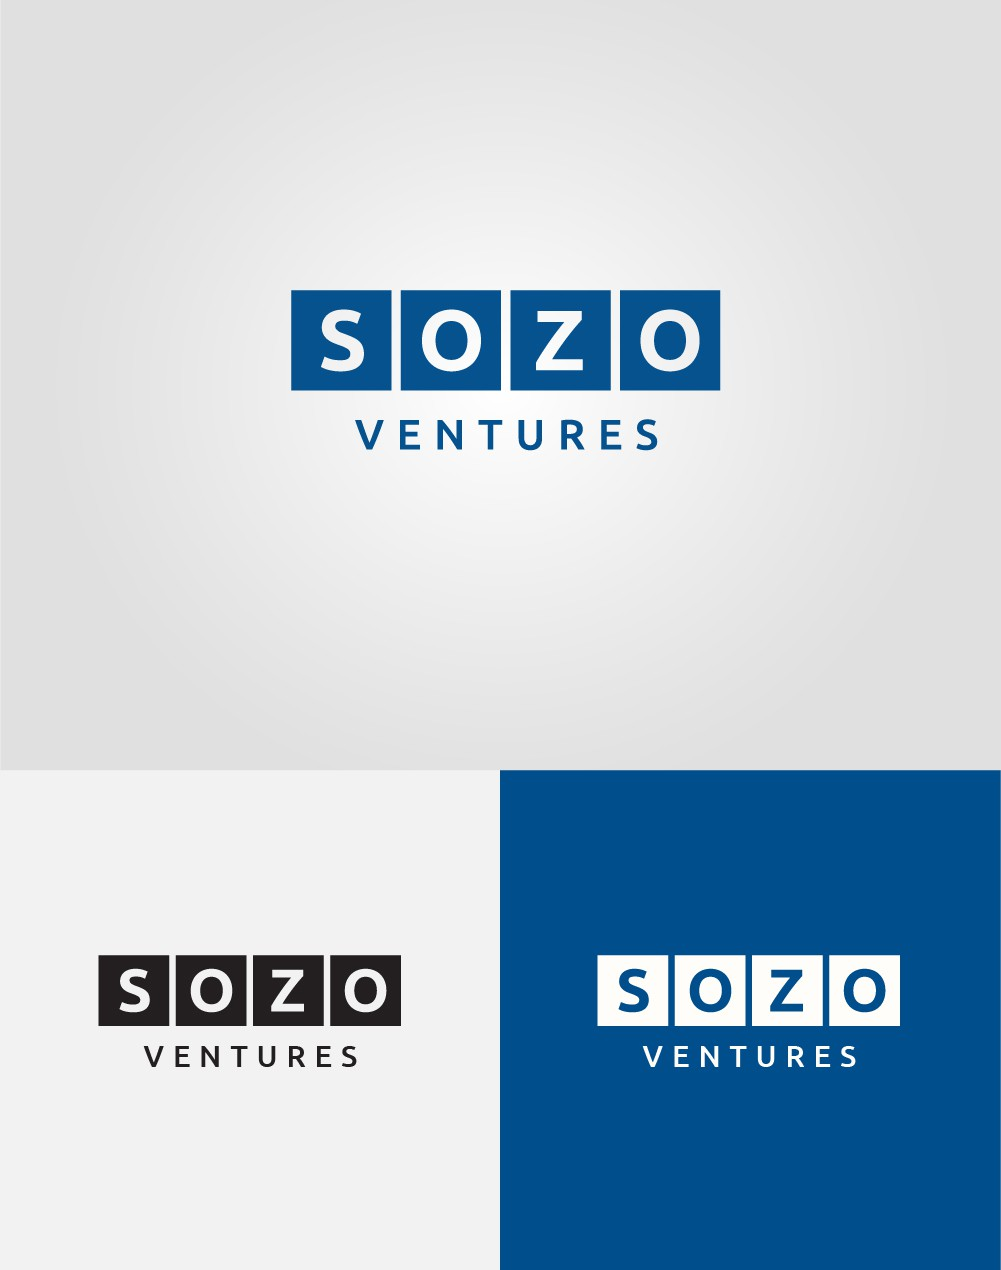 Sozo Ventures needs a new logo